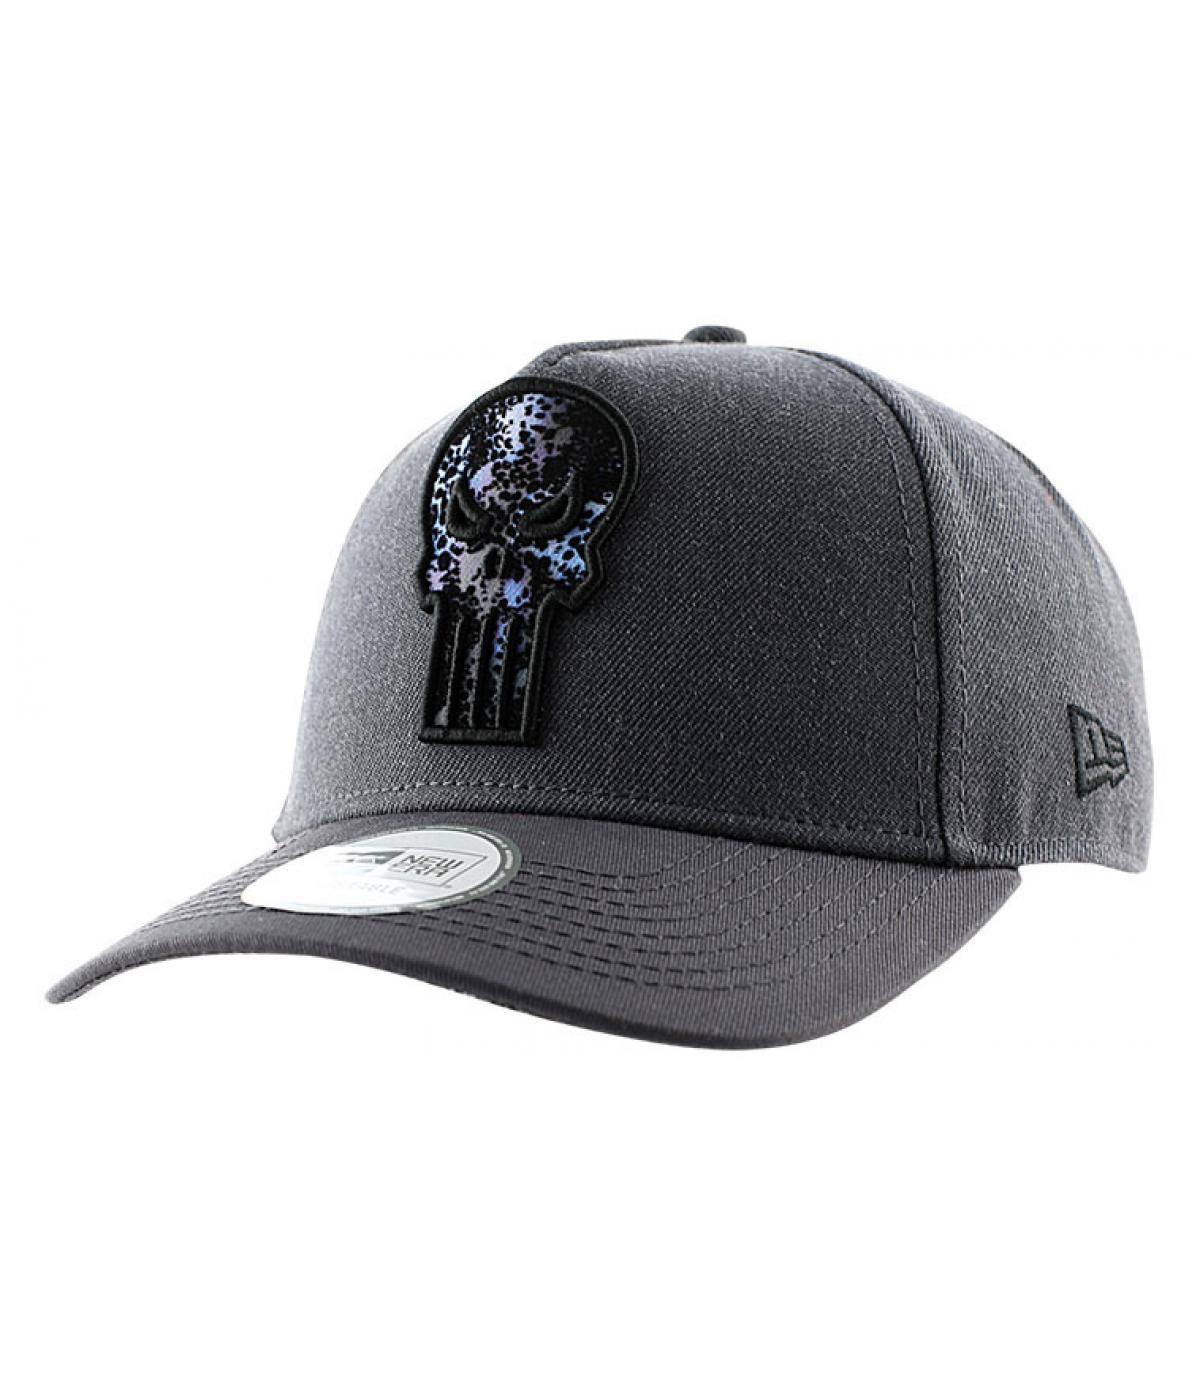 ... Grey Punisher curved cap - Character digi a frame punisher New Era -  image 3 ... 9bd9cb0e1d7